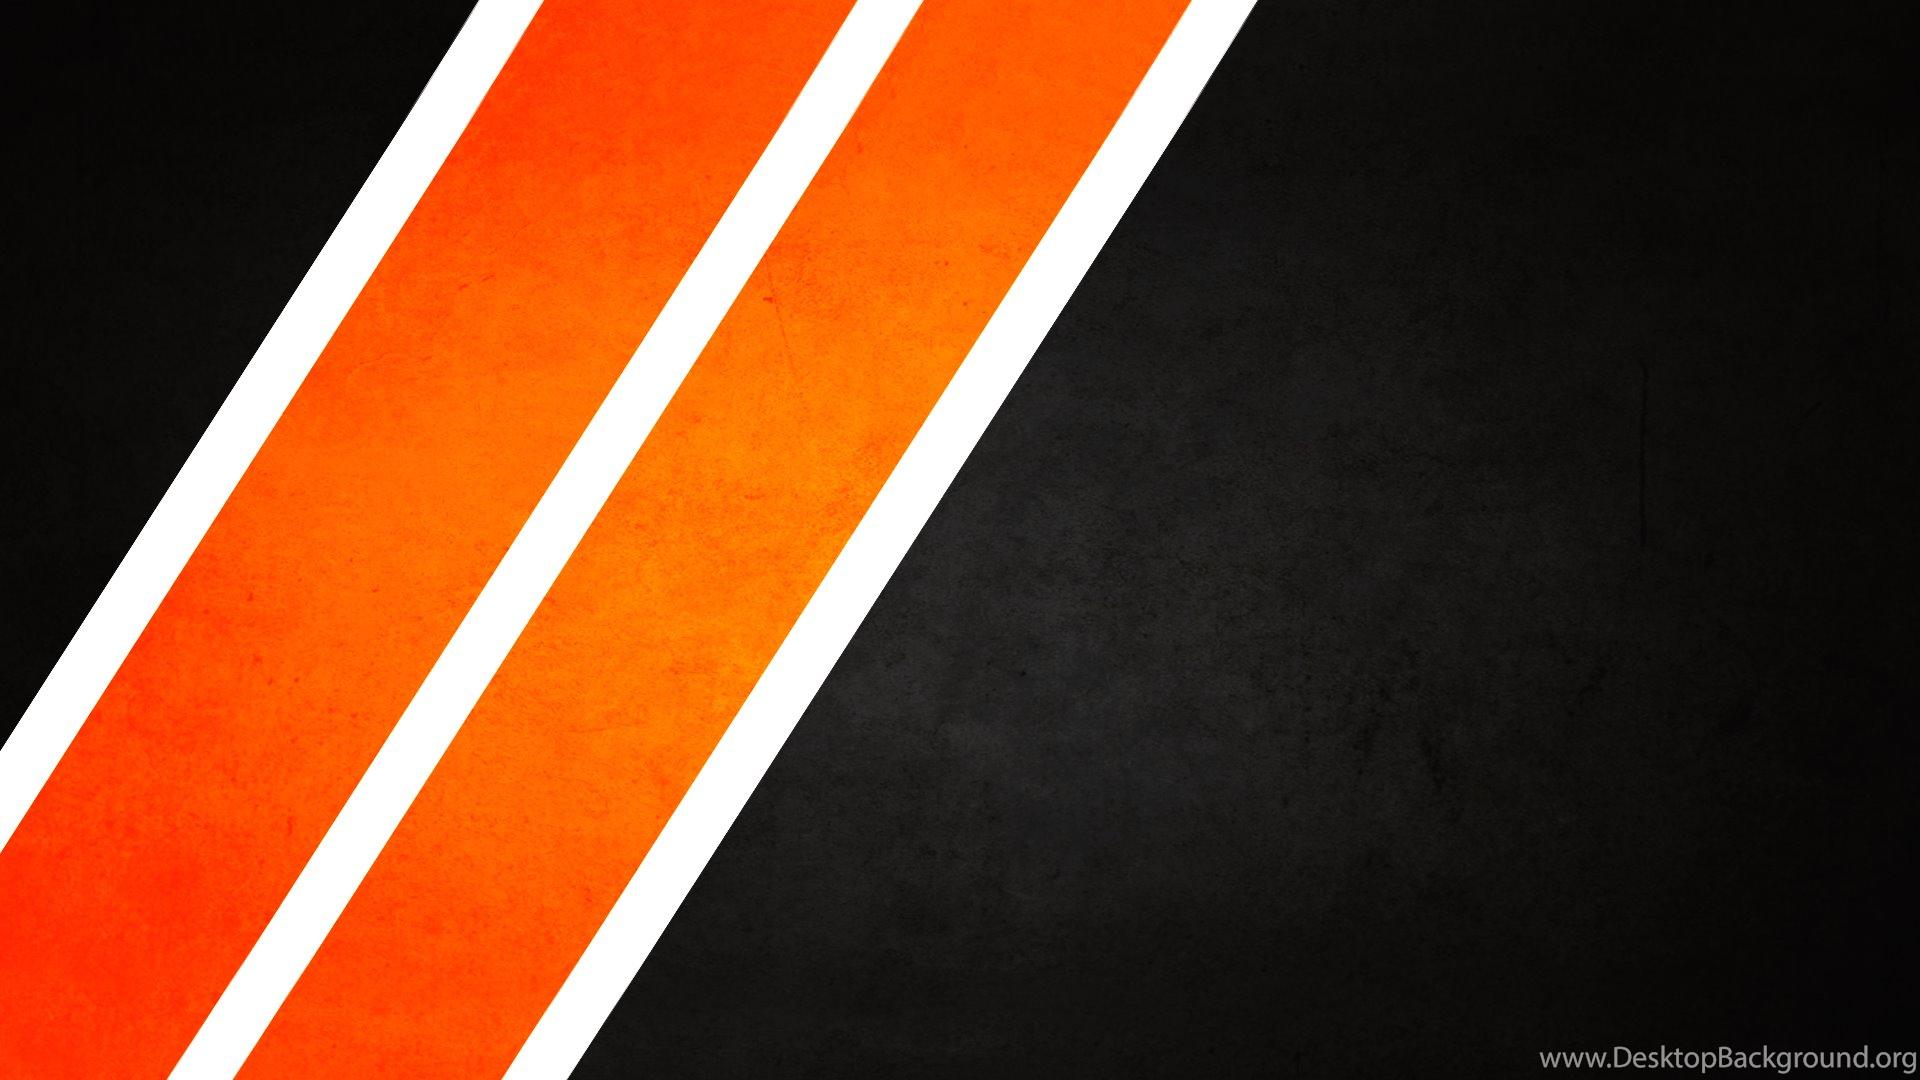 Red Grunge Background 1280x720: Grunge Orange Stripes Abstract Hd Wallpaper 1920×1080 6355